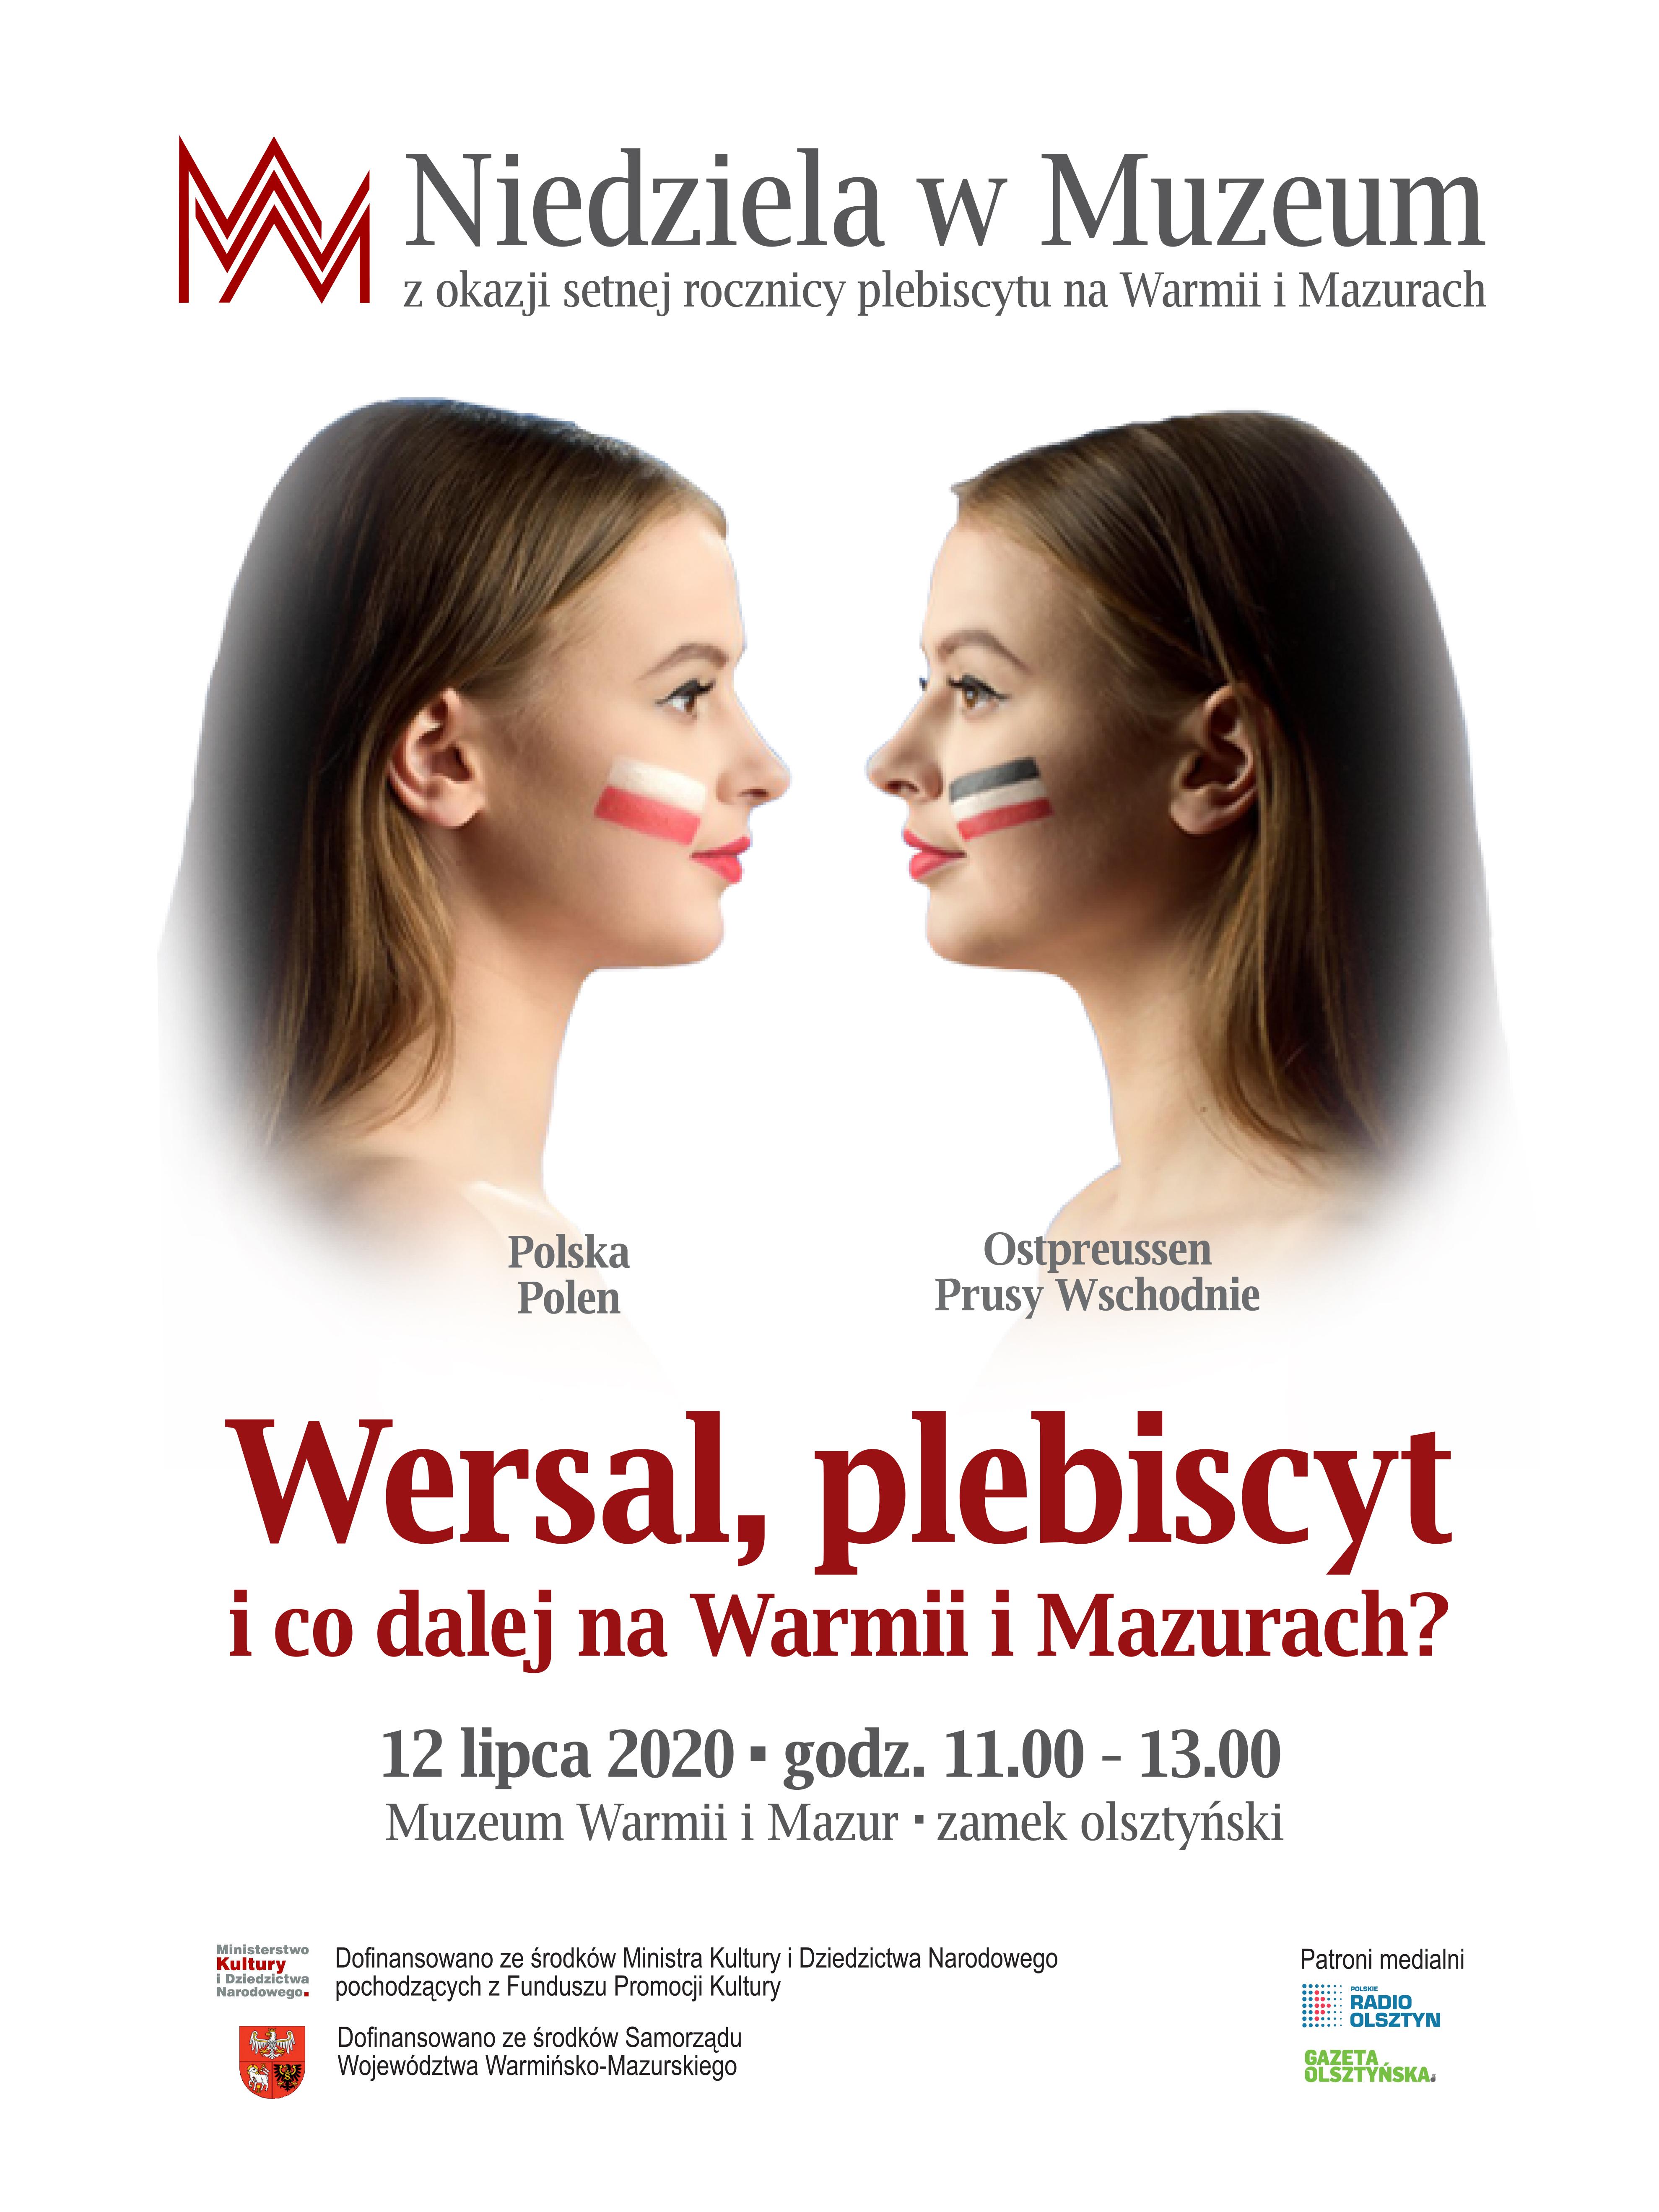 https://m.wmwm.pl/2020/07/orig/niedziela-a3-6752.jpg